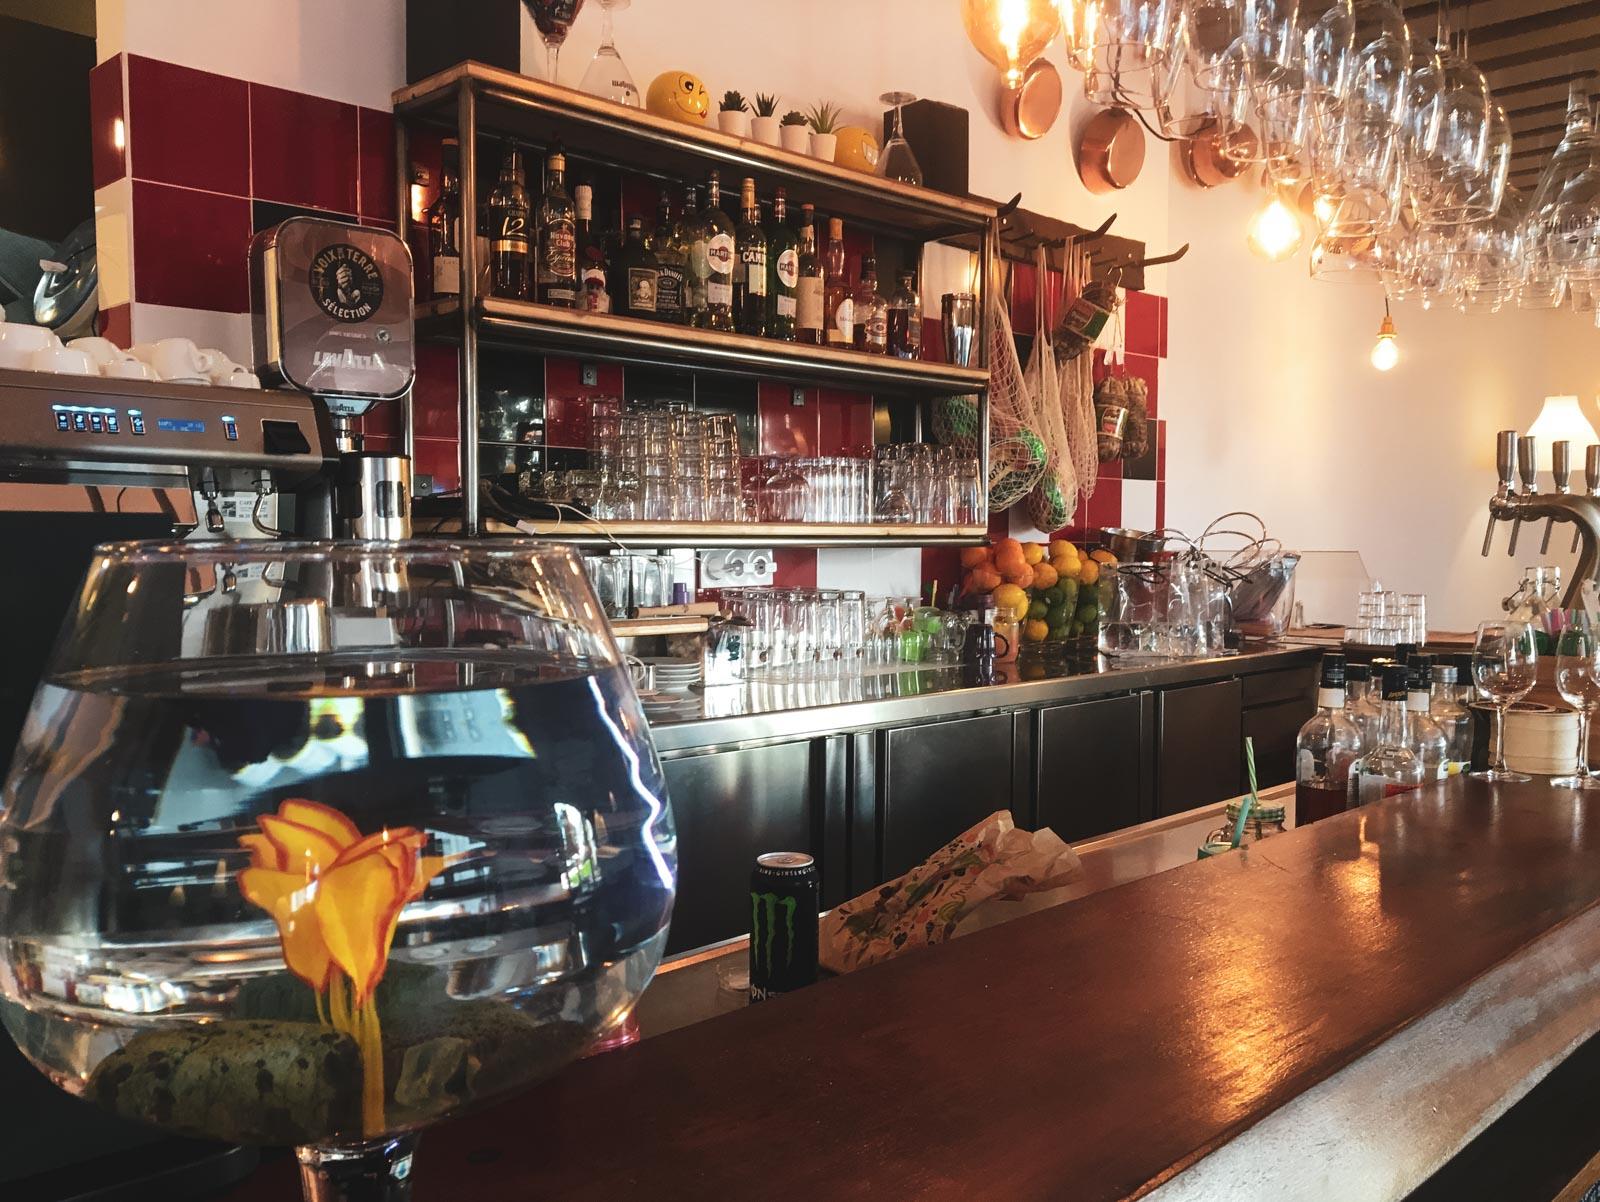 Hendaye - Trattoria della Nonna bar intérieur